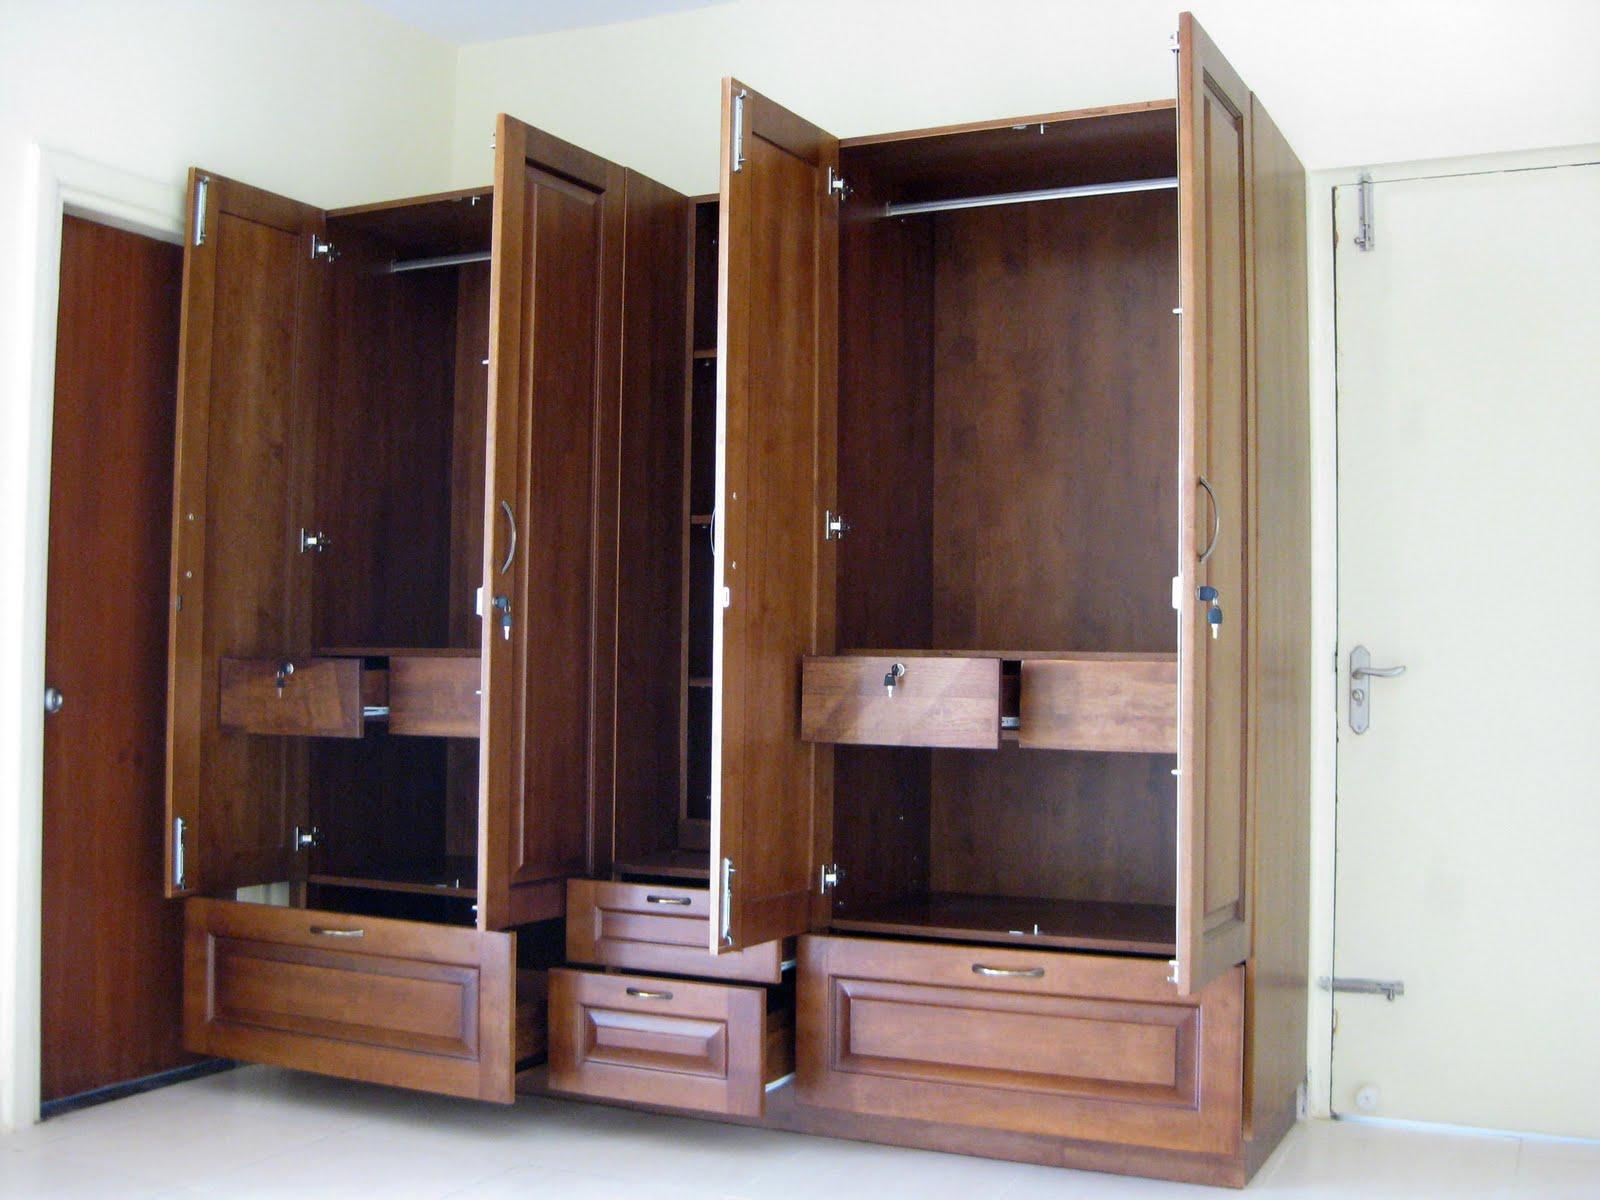 gambar model lemari pakaian modern terbaru